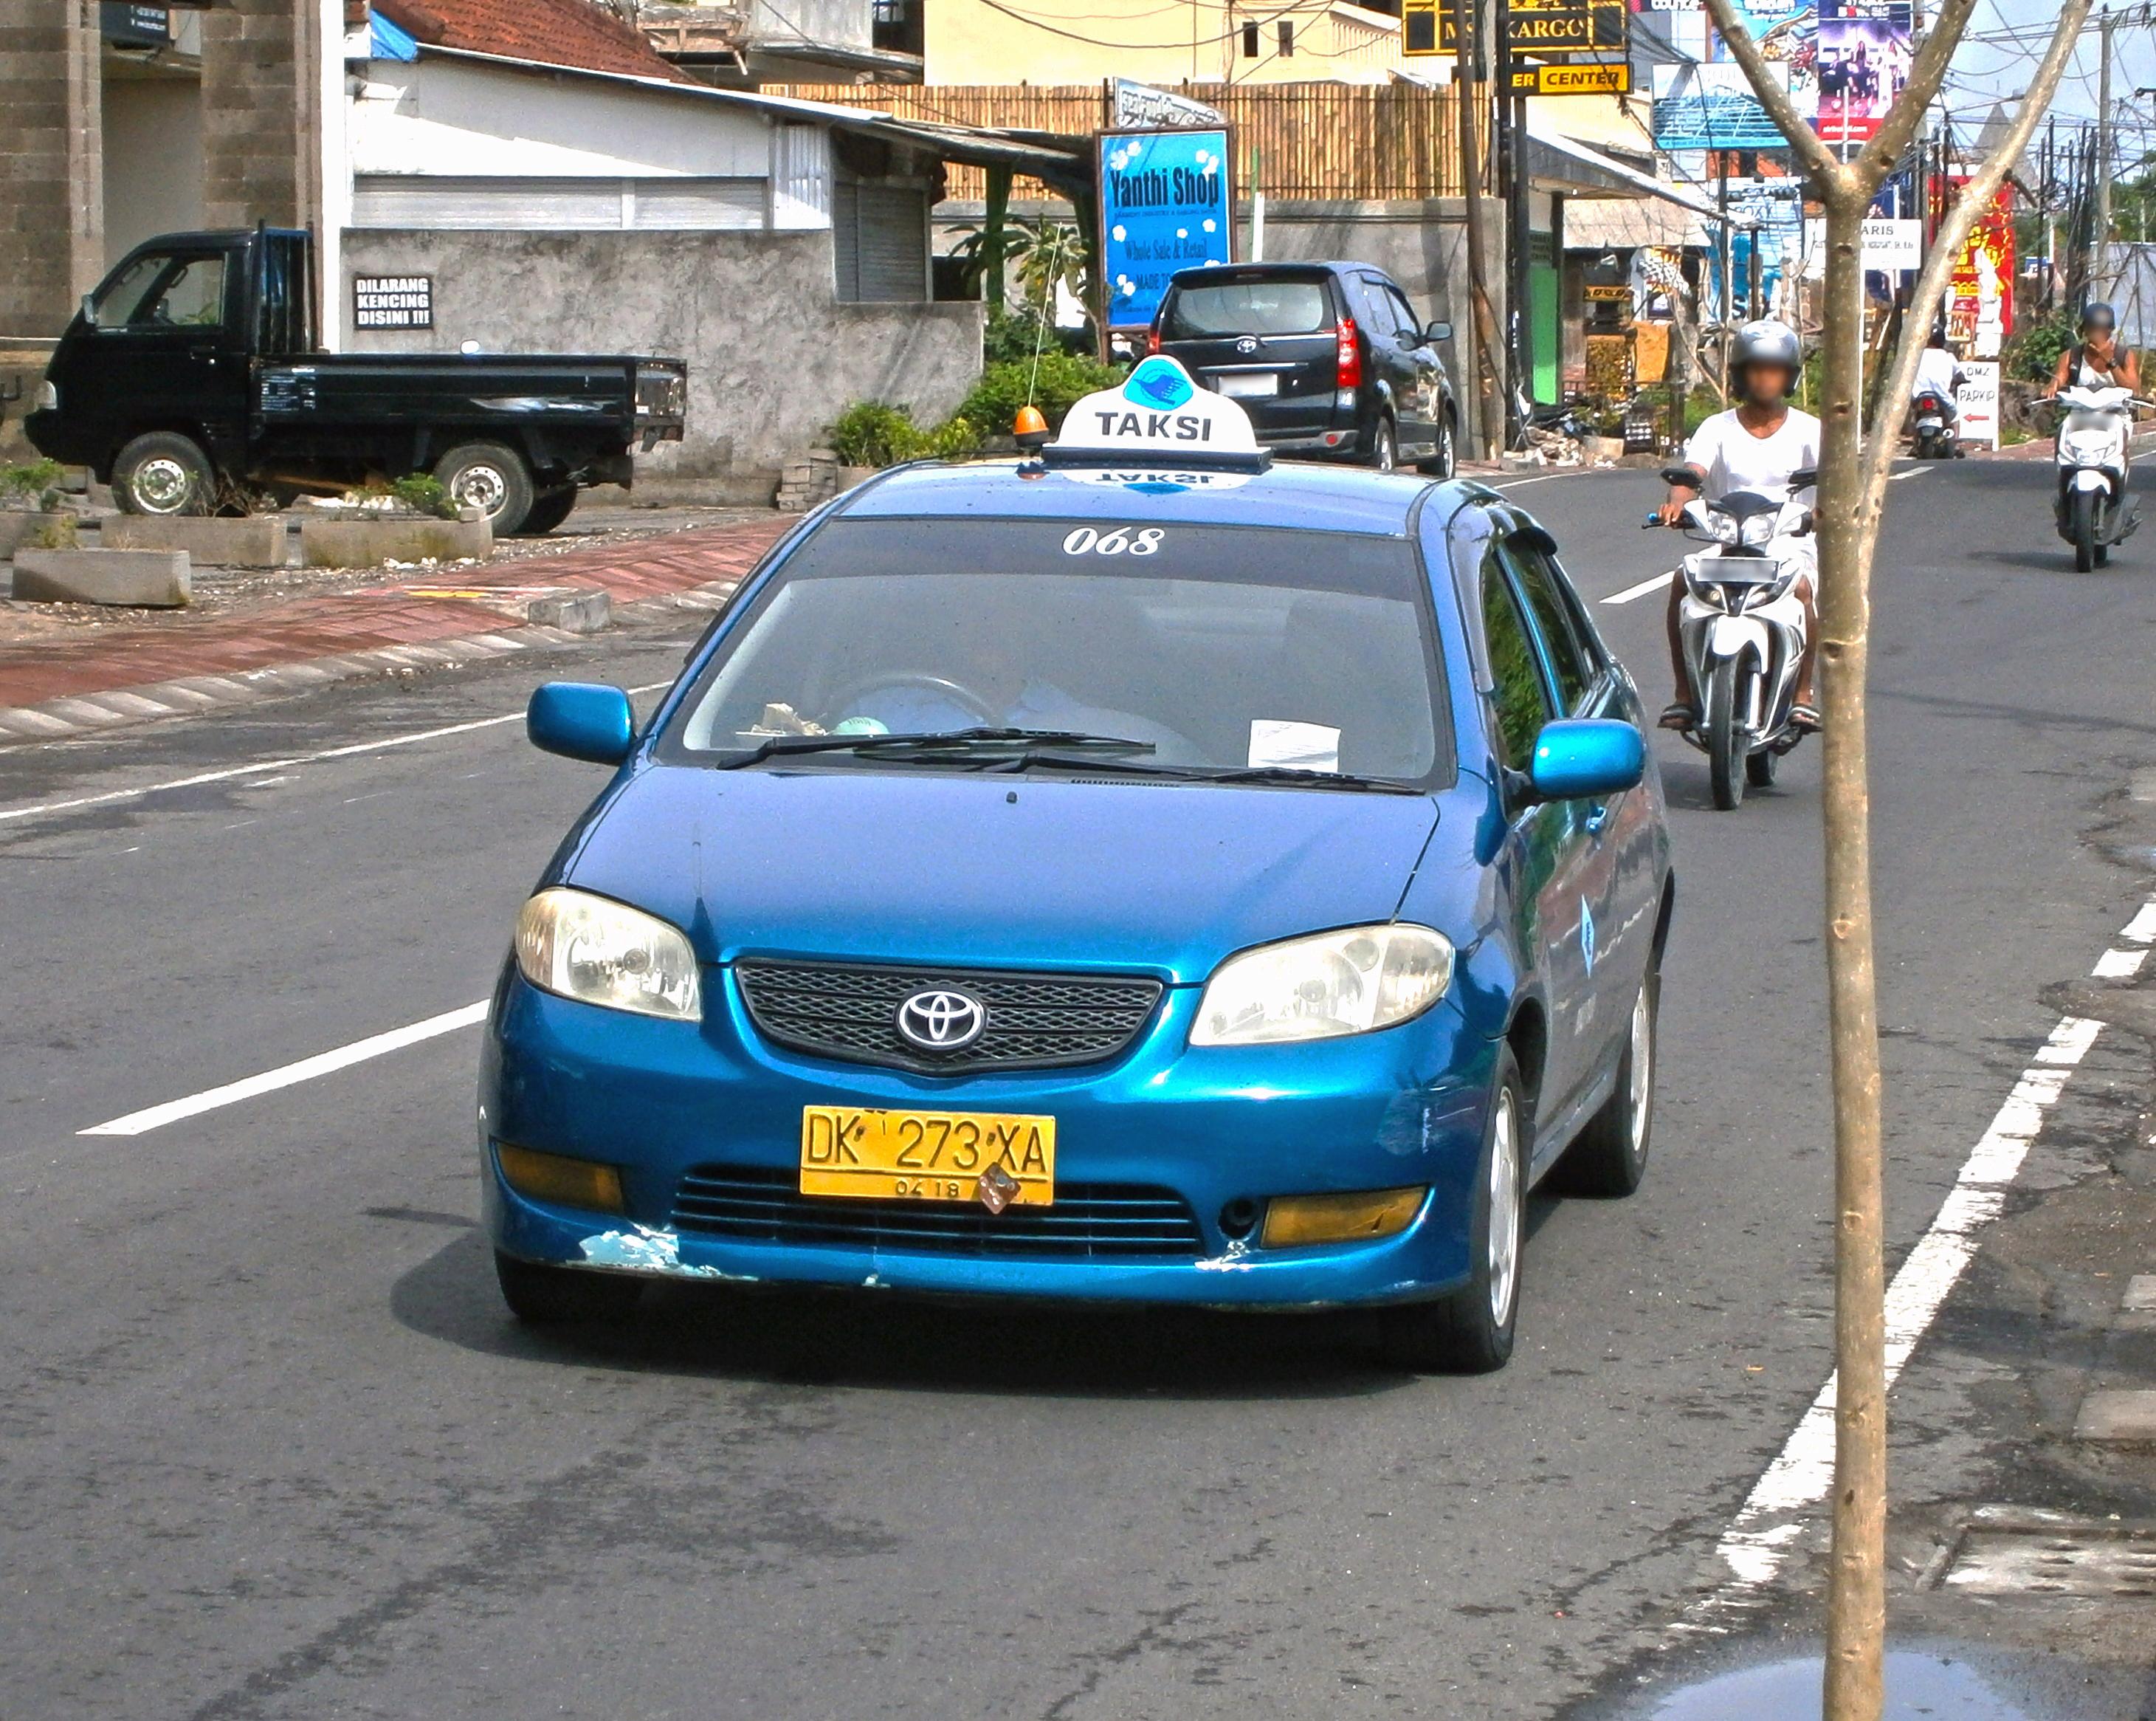 File:2003–2005 Toyota Vios taxi in Kuta, Bali, Indonesia (01).jpg - Wikimedia Commons